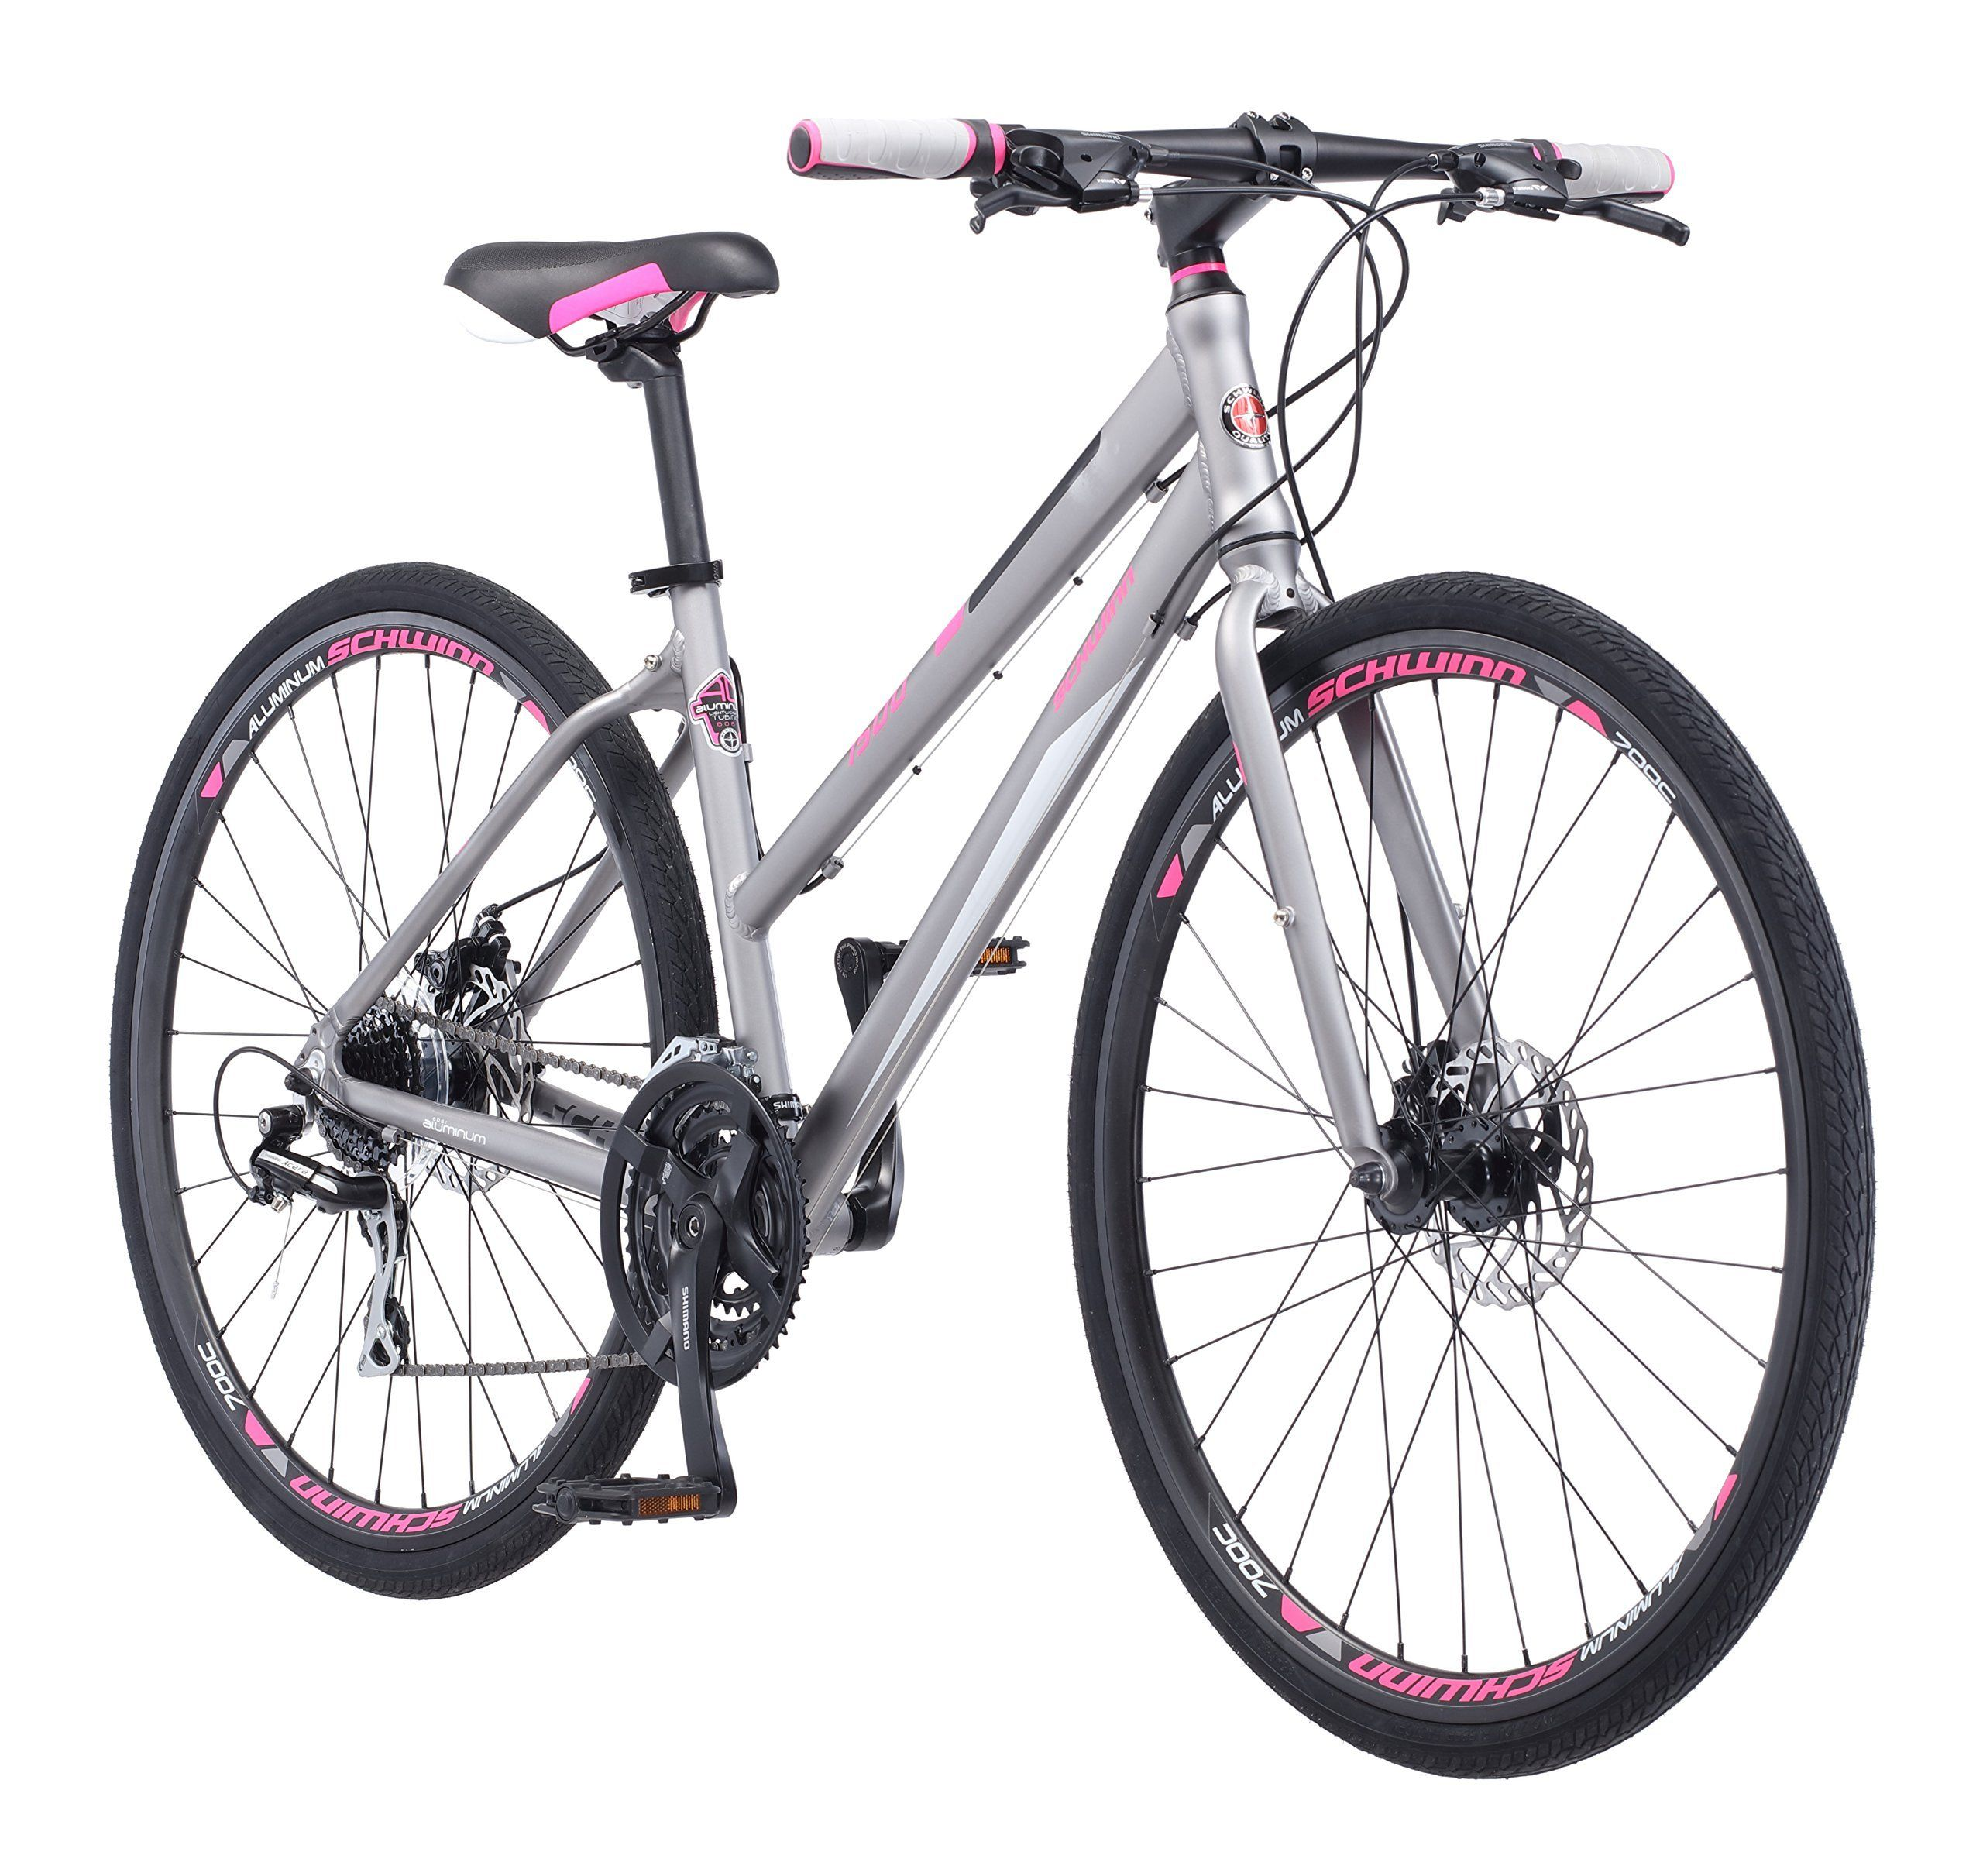 Schwinn Phocus 1500 Flat Bar Sport Fitness Hybrid Bikes 17 Inch Small Step Through Or 19 Inch Hybrid Bike Touring Bike Schwinn